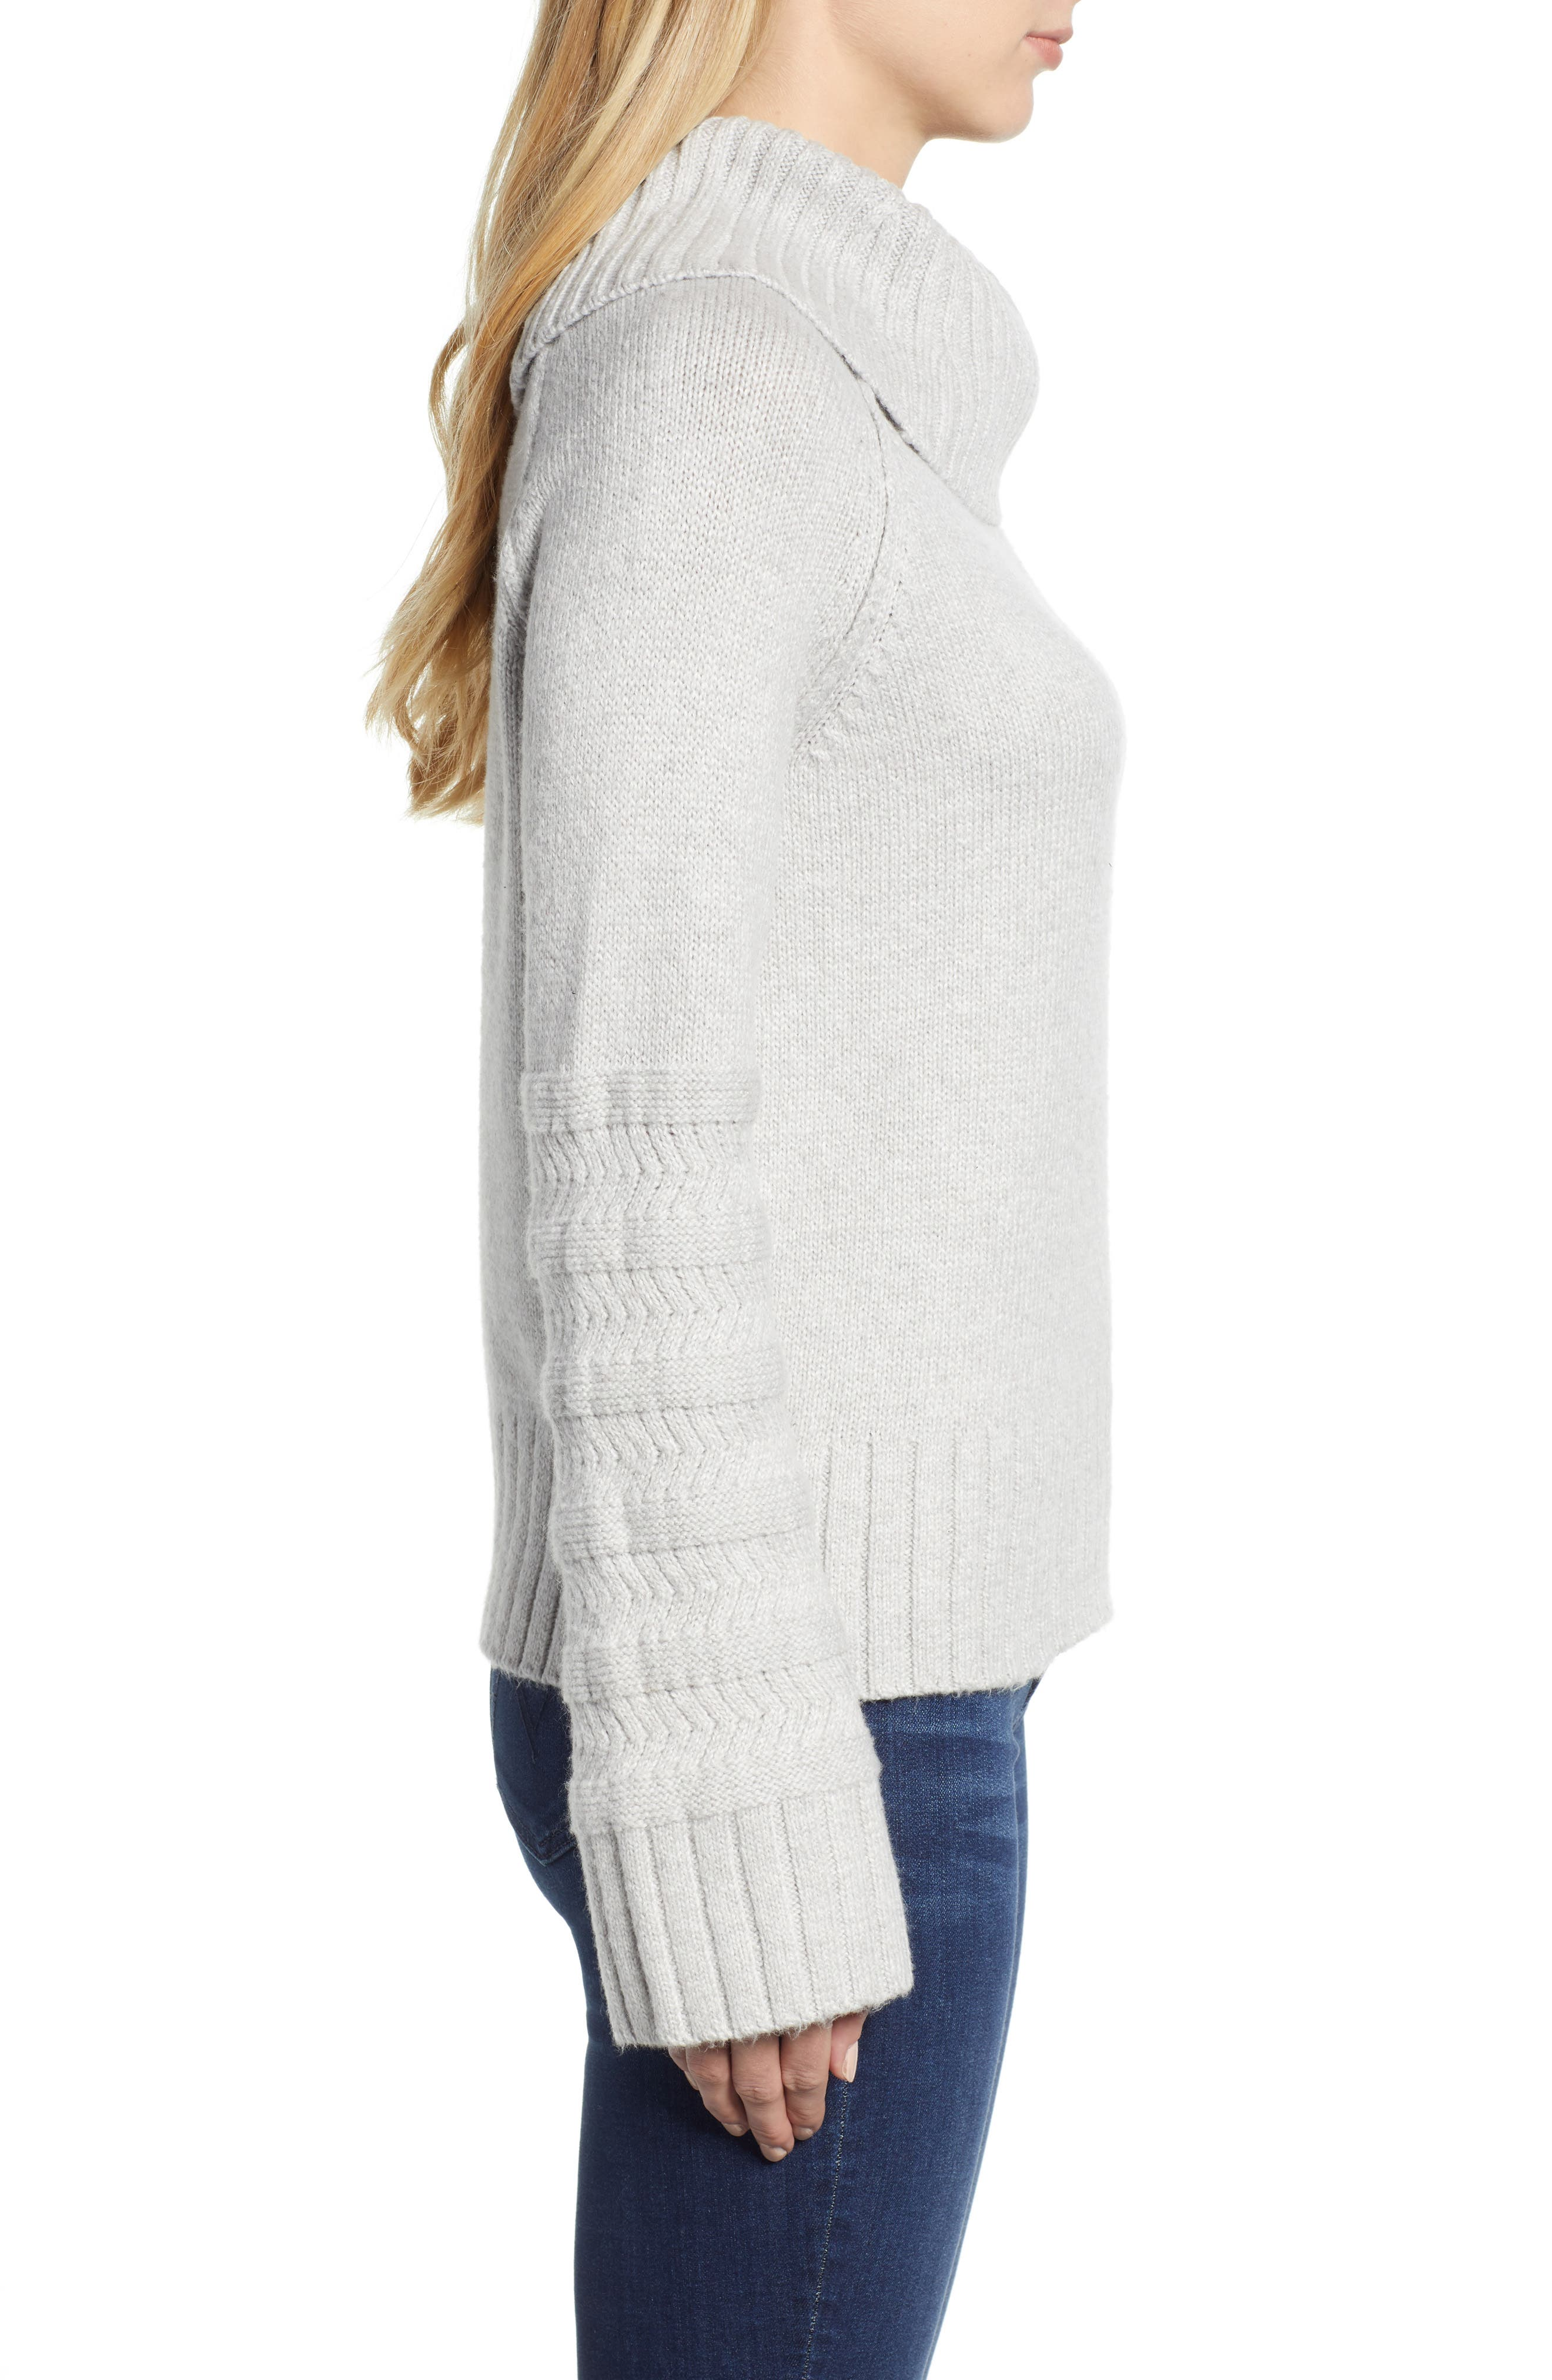 Turtleneck Sweater,                             Alternate thumbnail 3, color,                             GREY LIGHT HEATHER